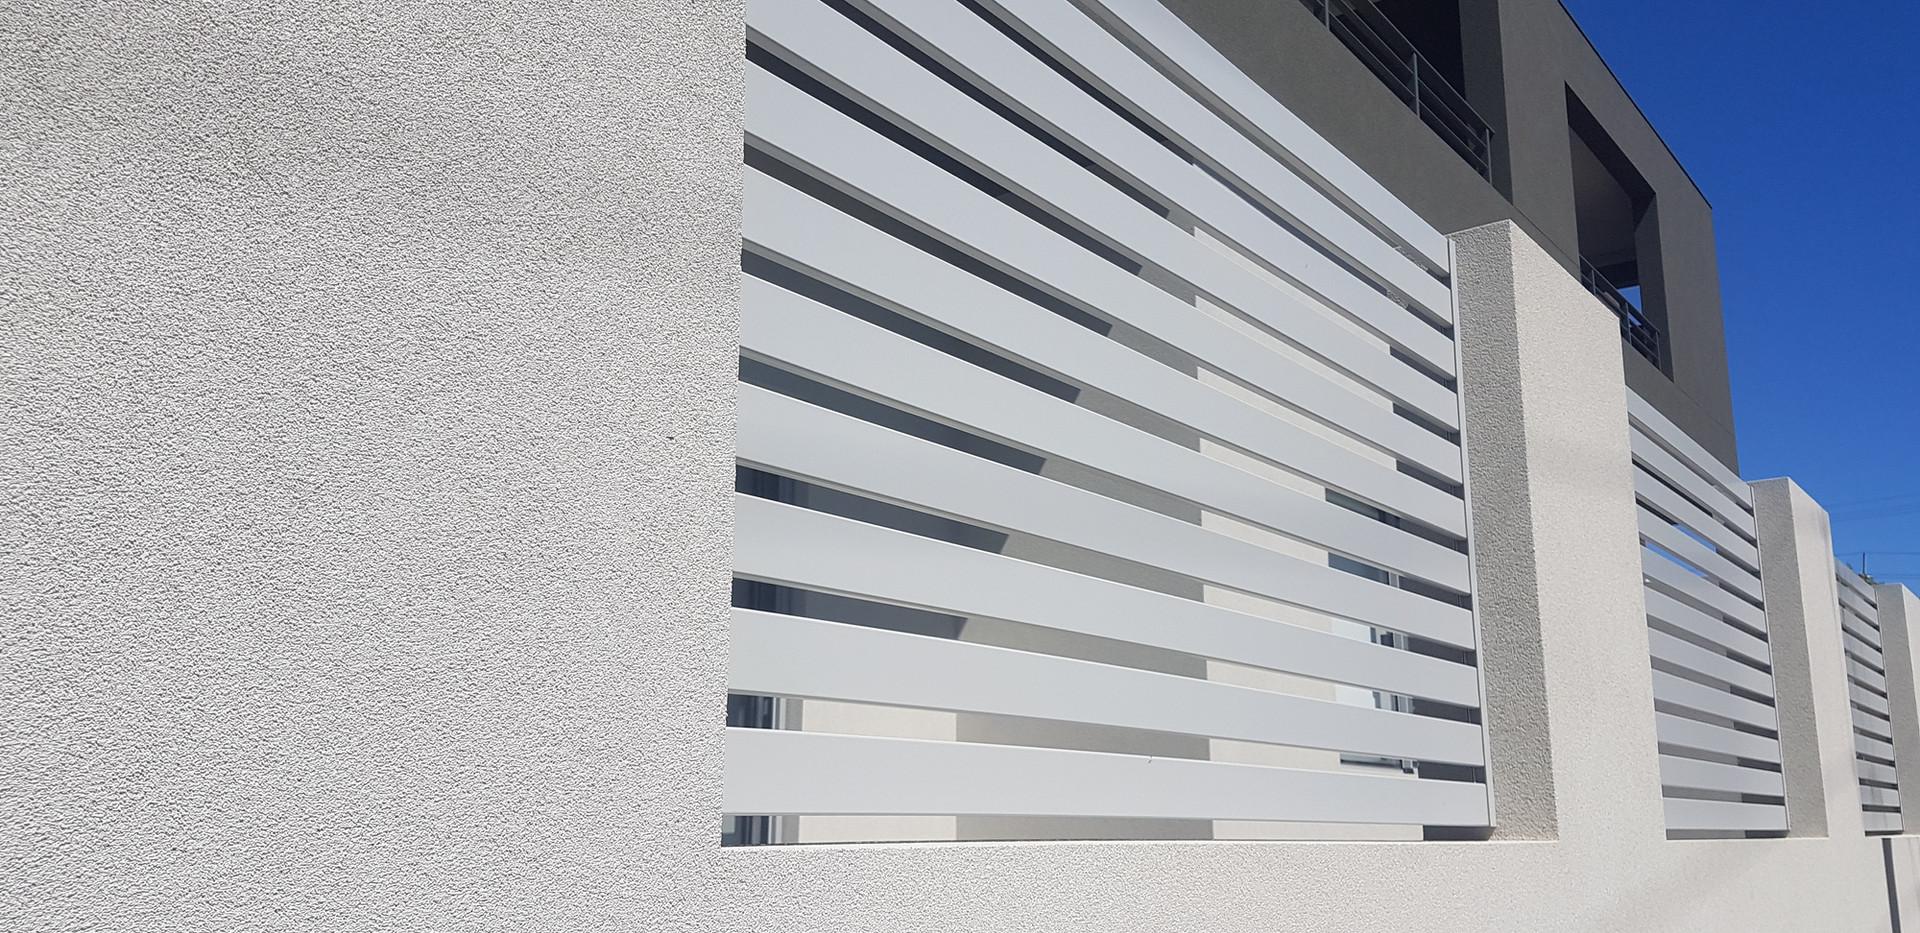 Aluminium Fence - Grey Side View